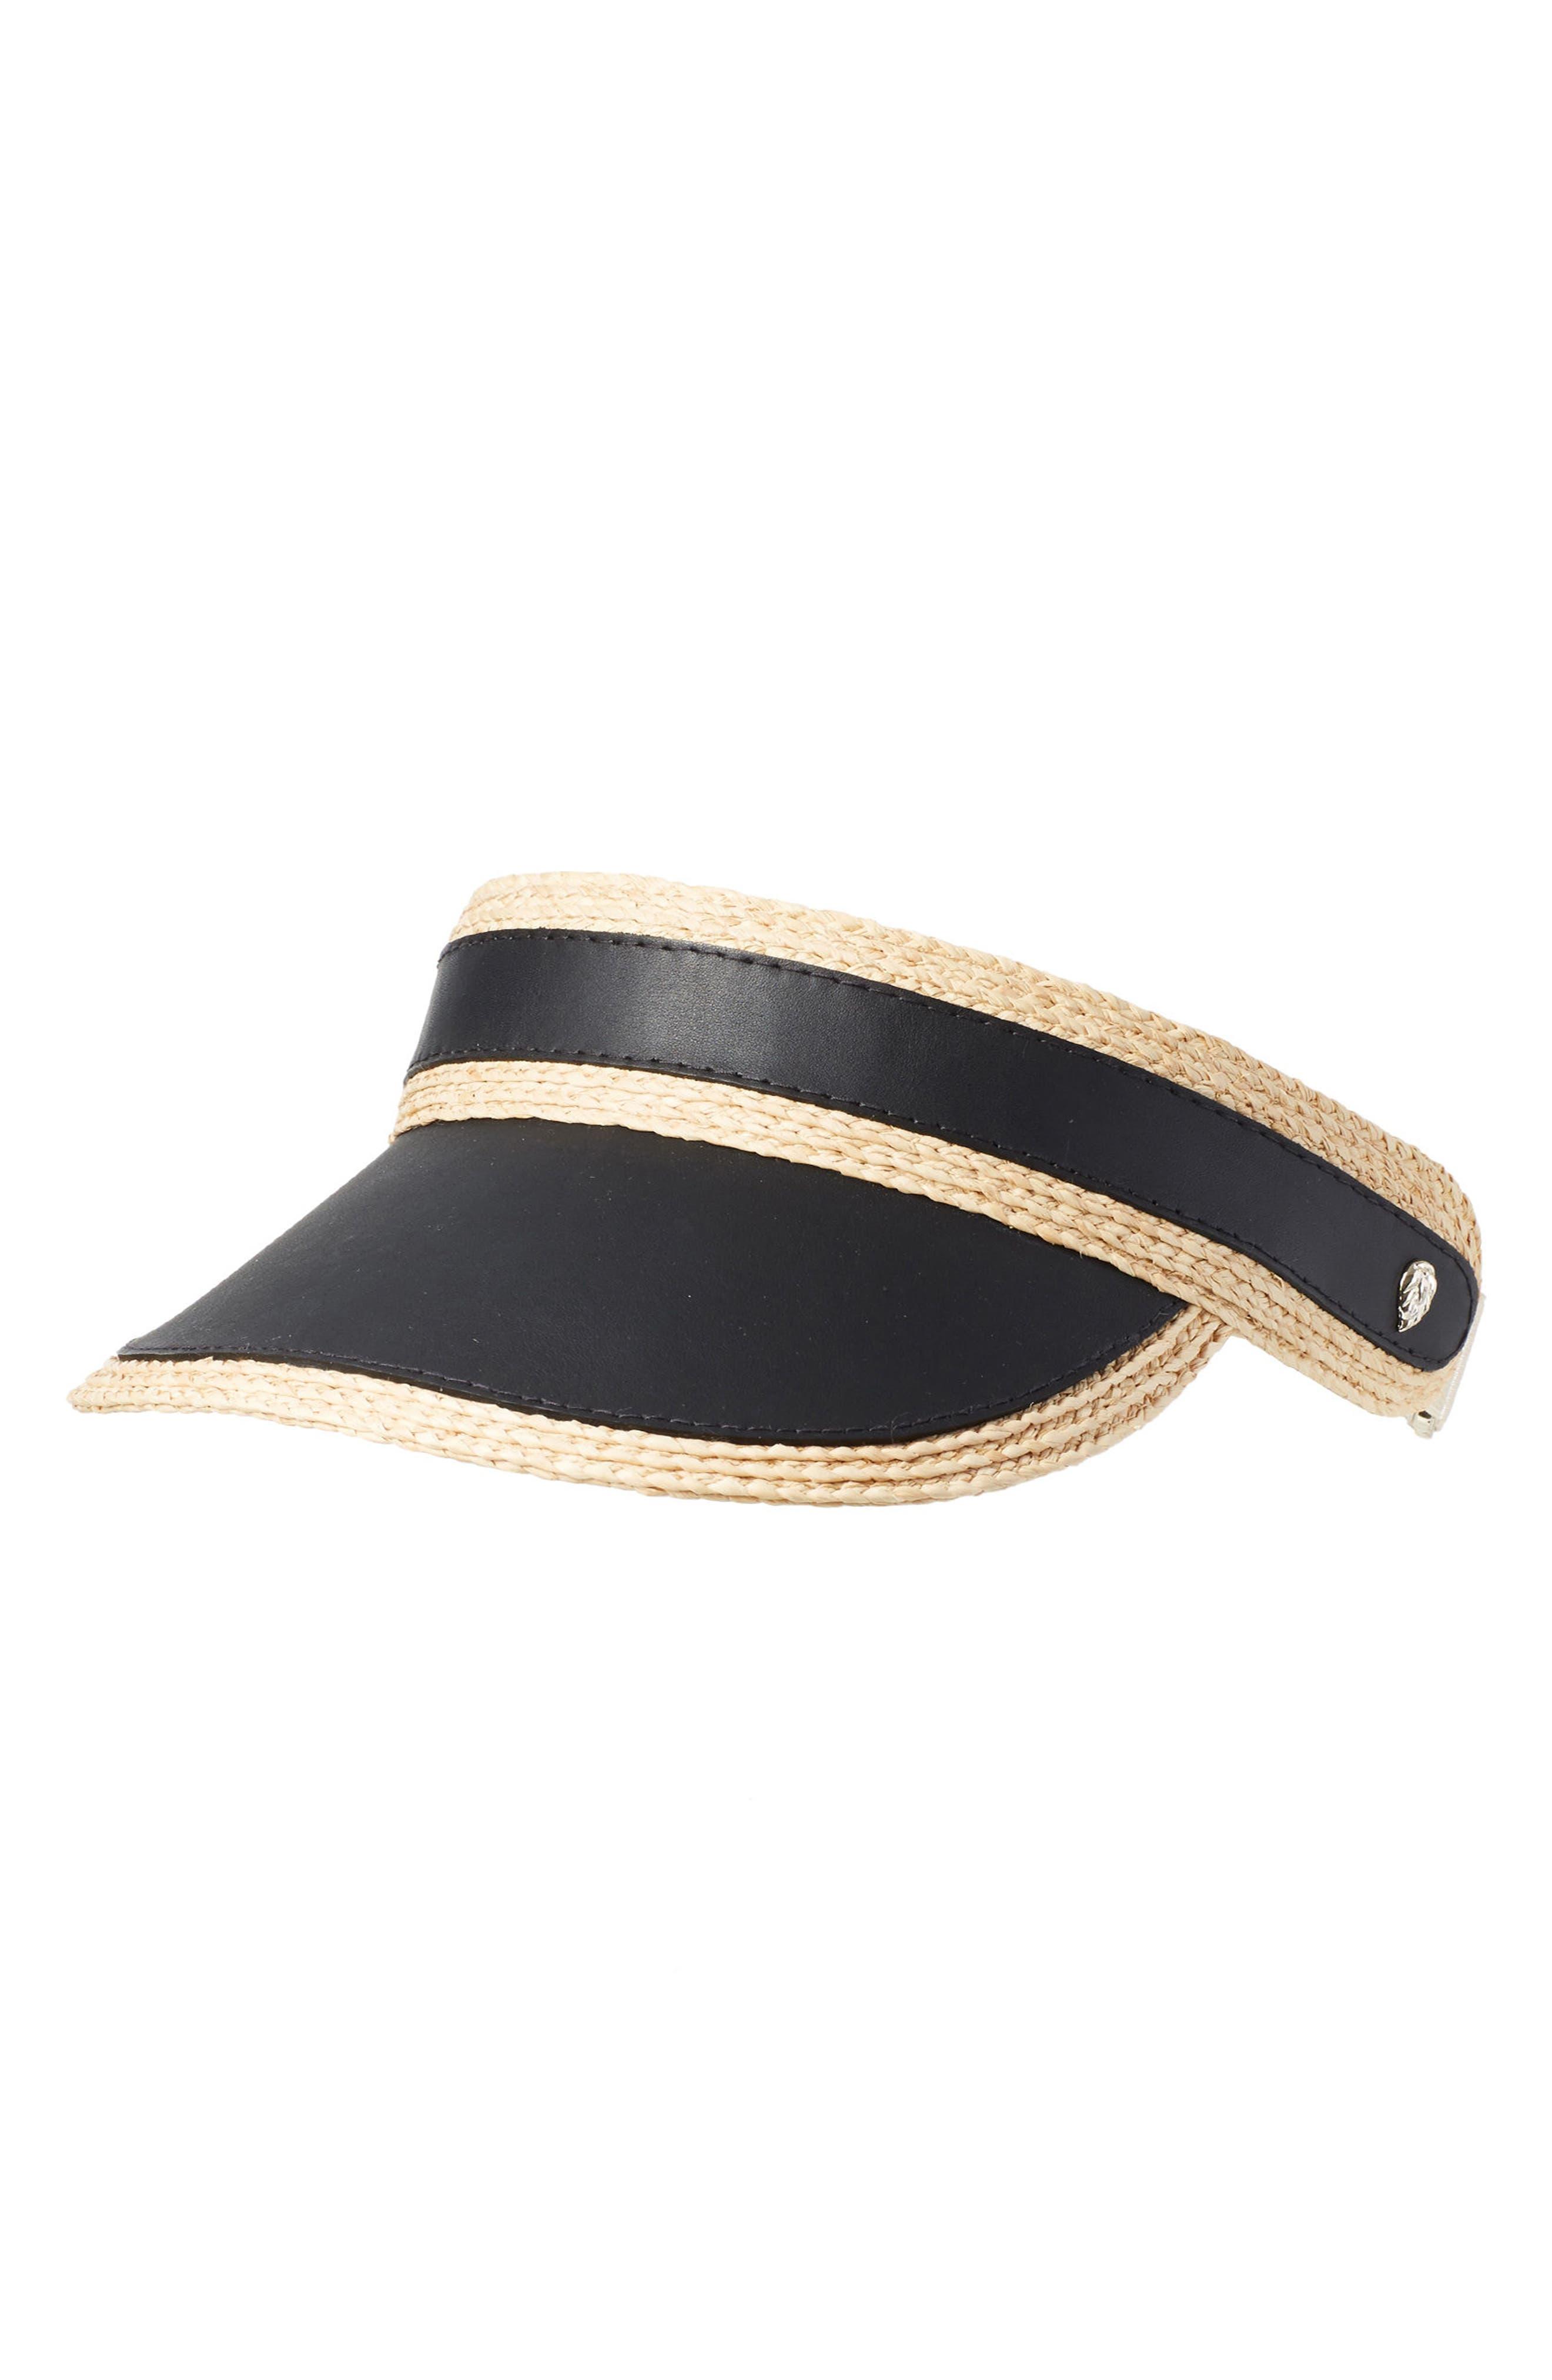 Leather & Raffia Visor,                         Main,                         color, Black/ Natural